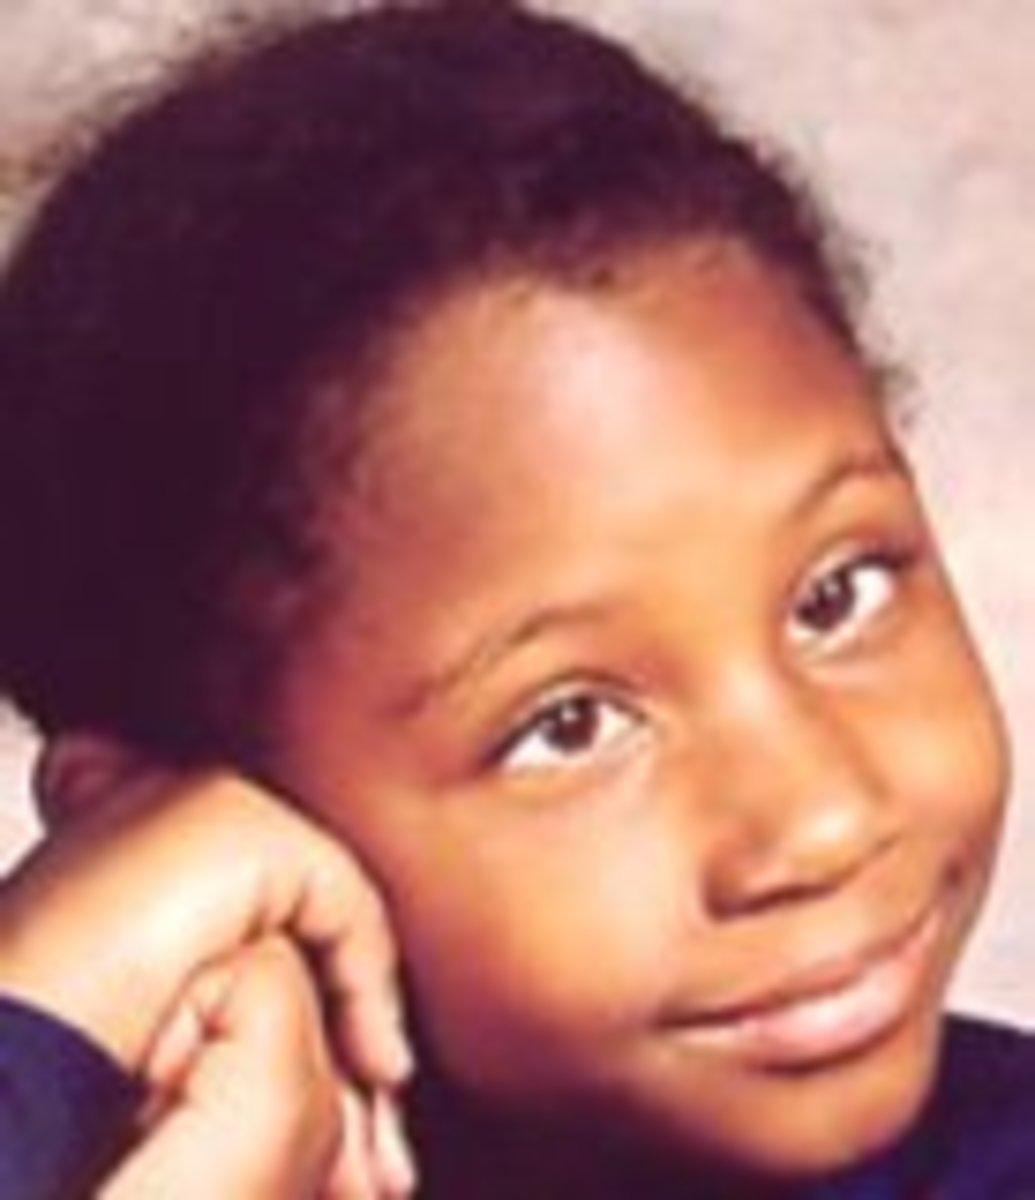 Tiahease Tiawanna Jackson